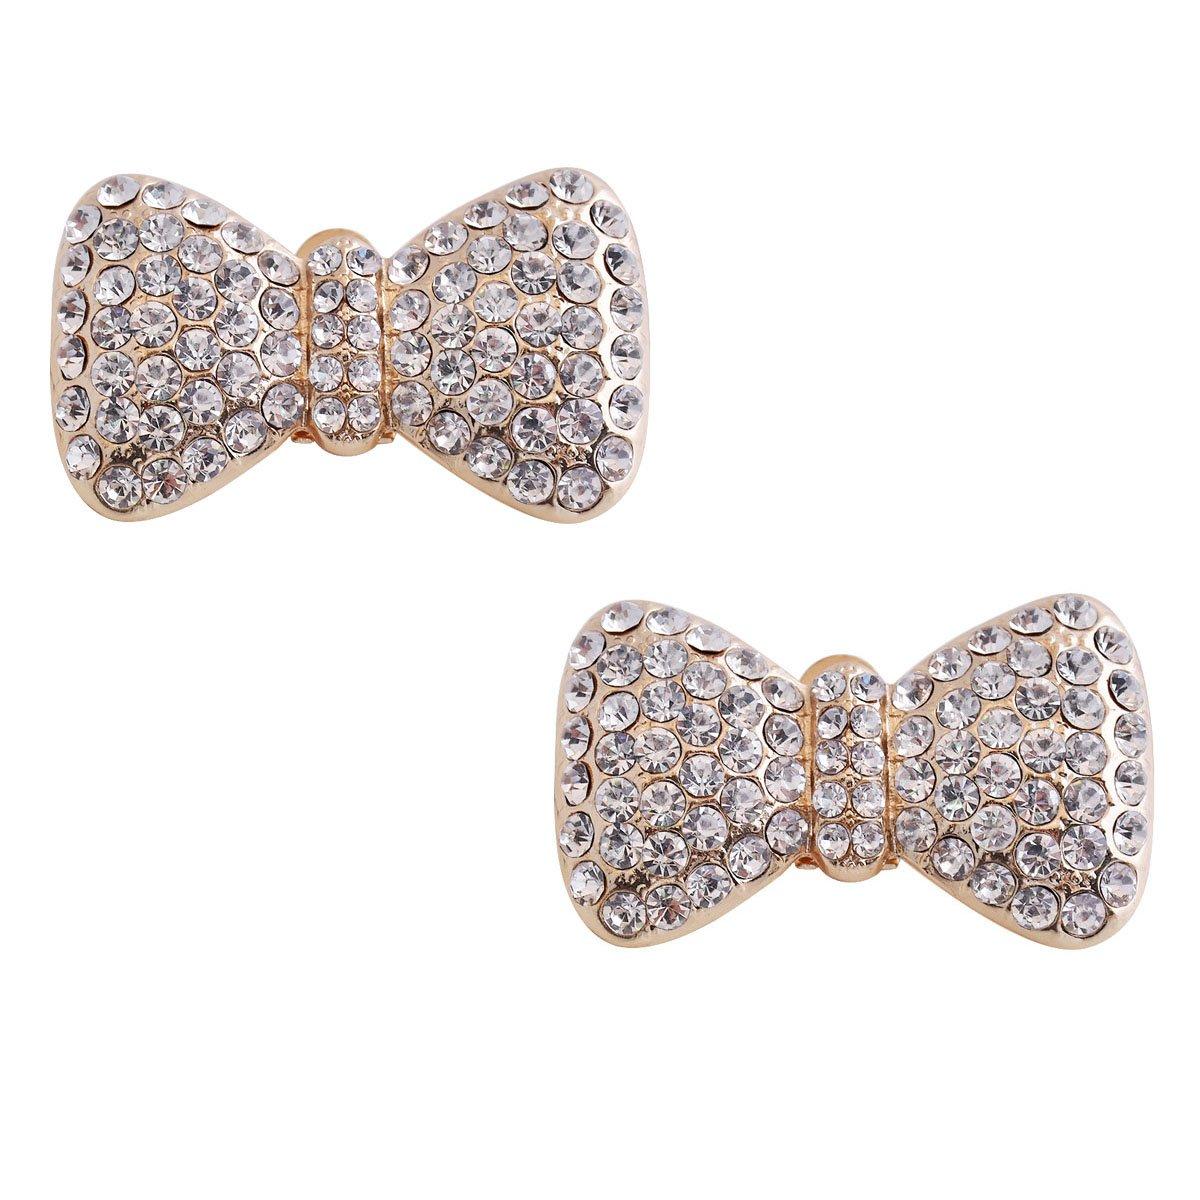 ElegantPark CF 2 Pcs Shoe Clips Crystal Bows Design Wedding Party Decoration Gold